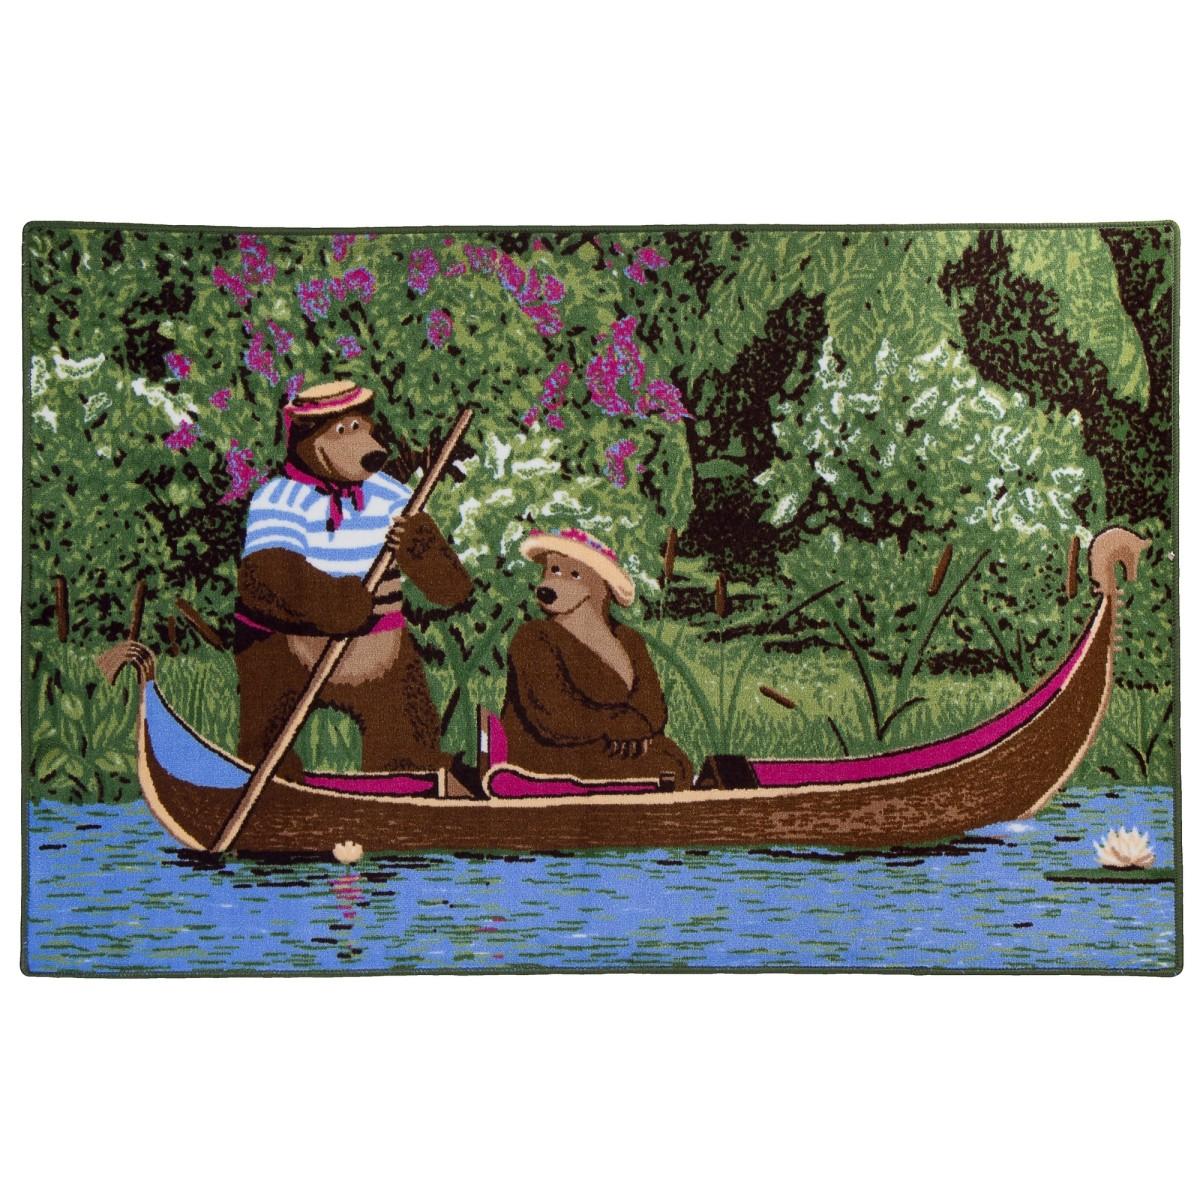 Ковер Маша и Медведь на лодке размер 1х15 м